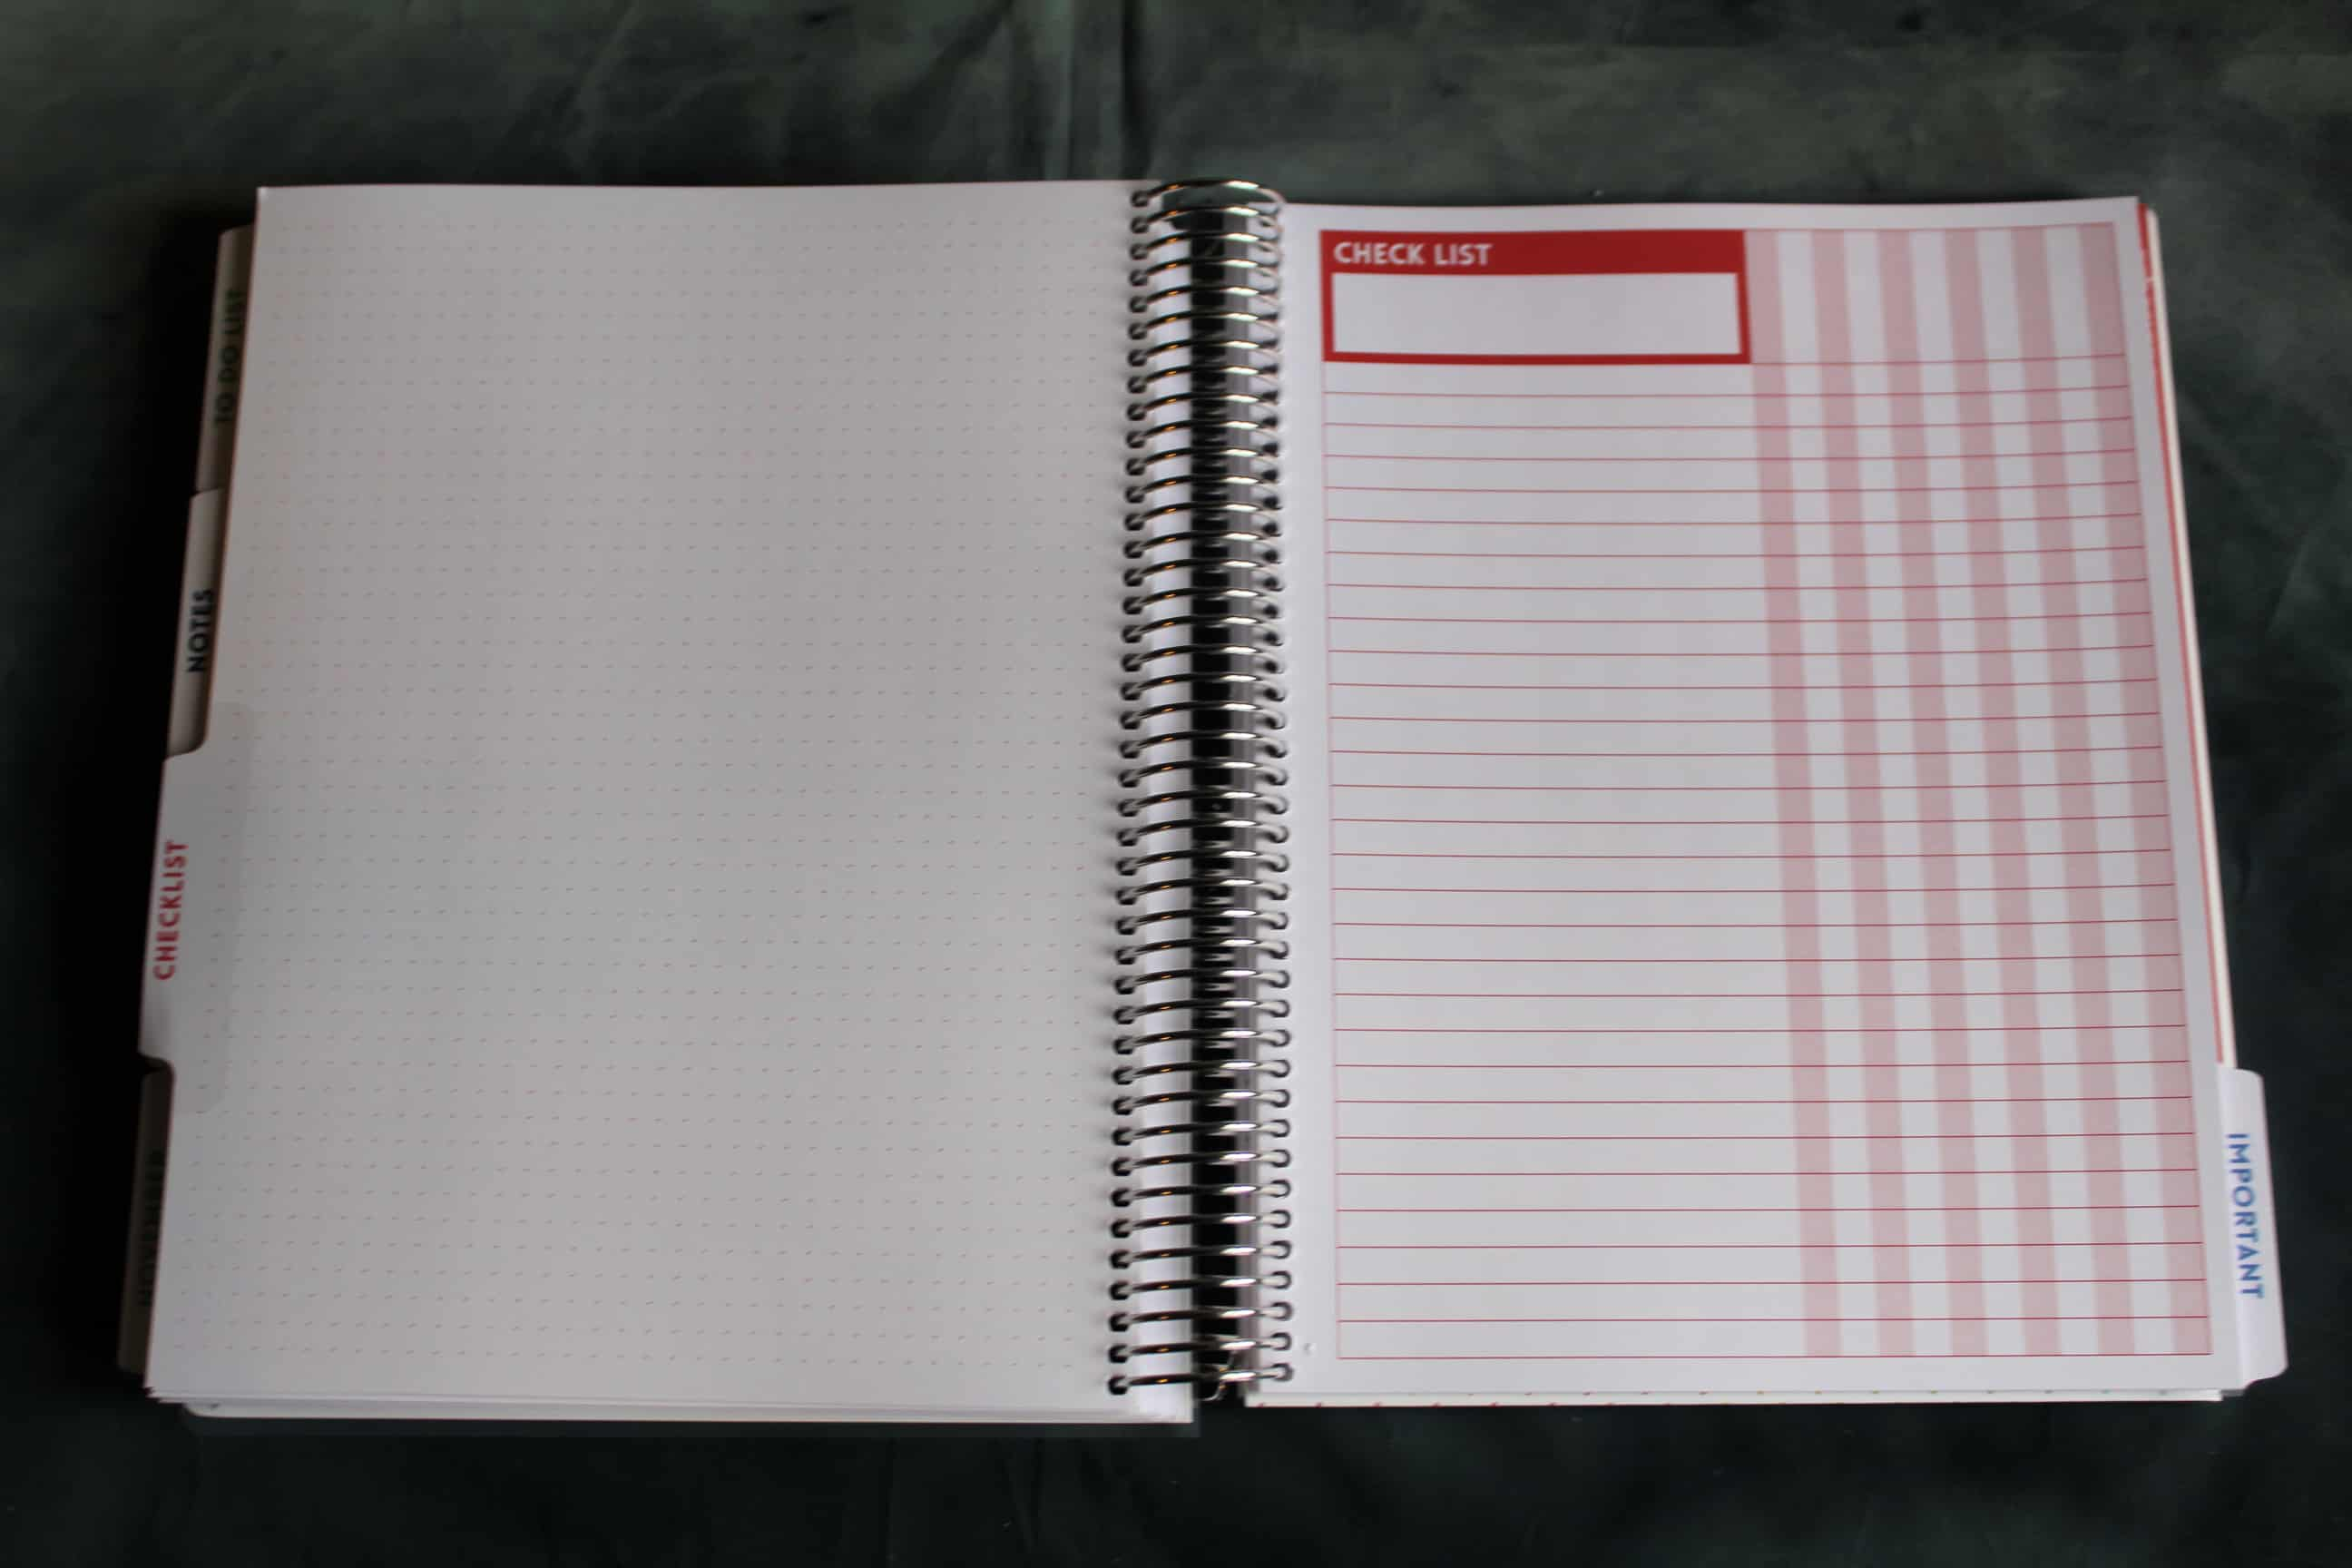 Planner with Checklist